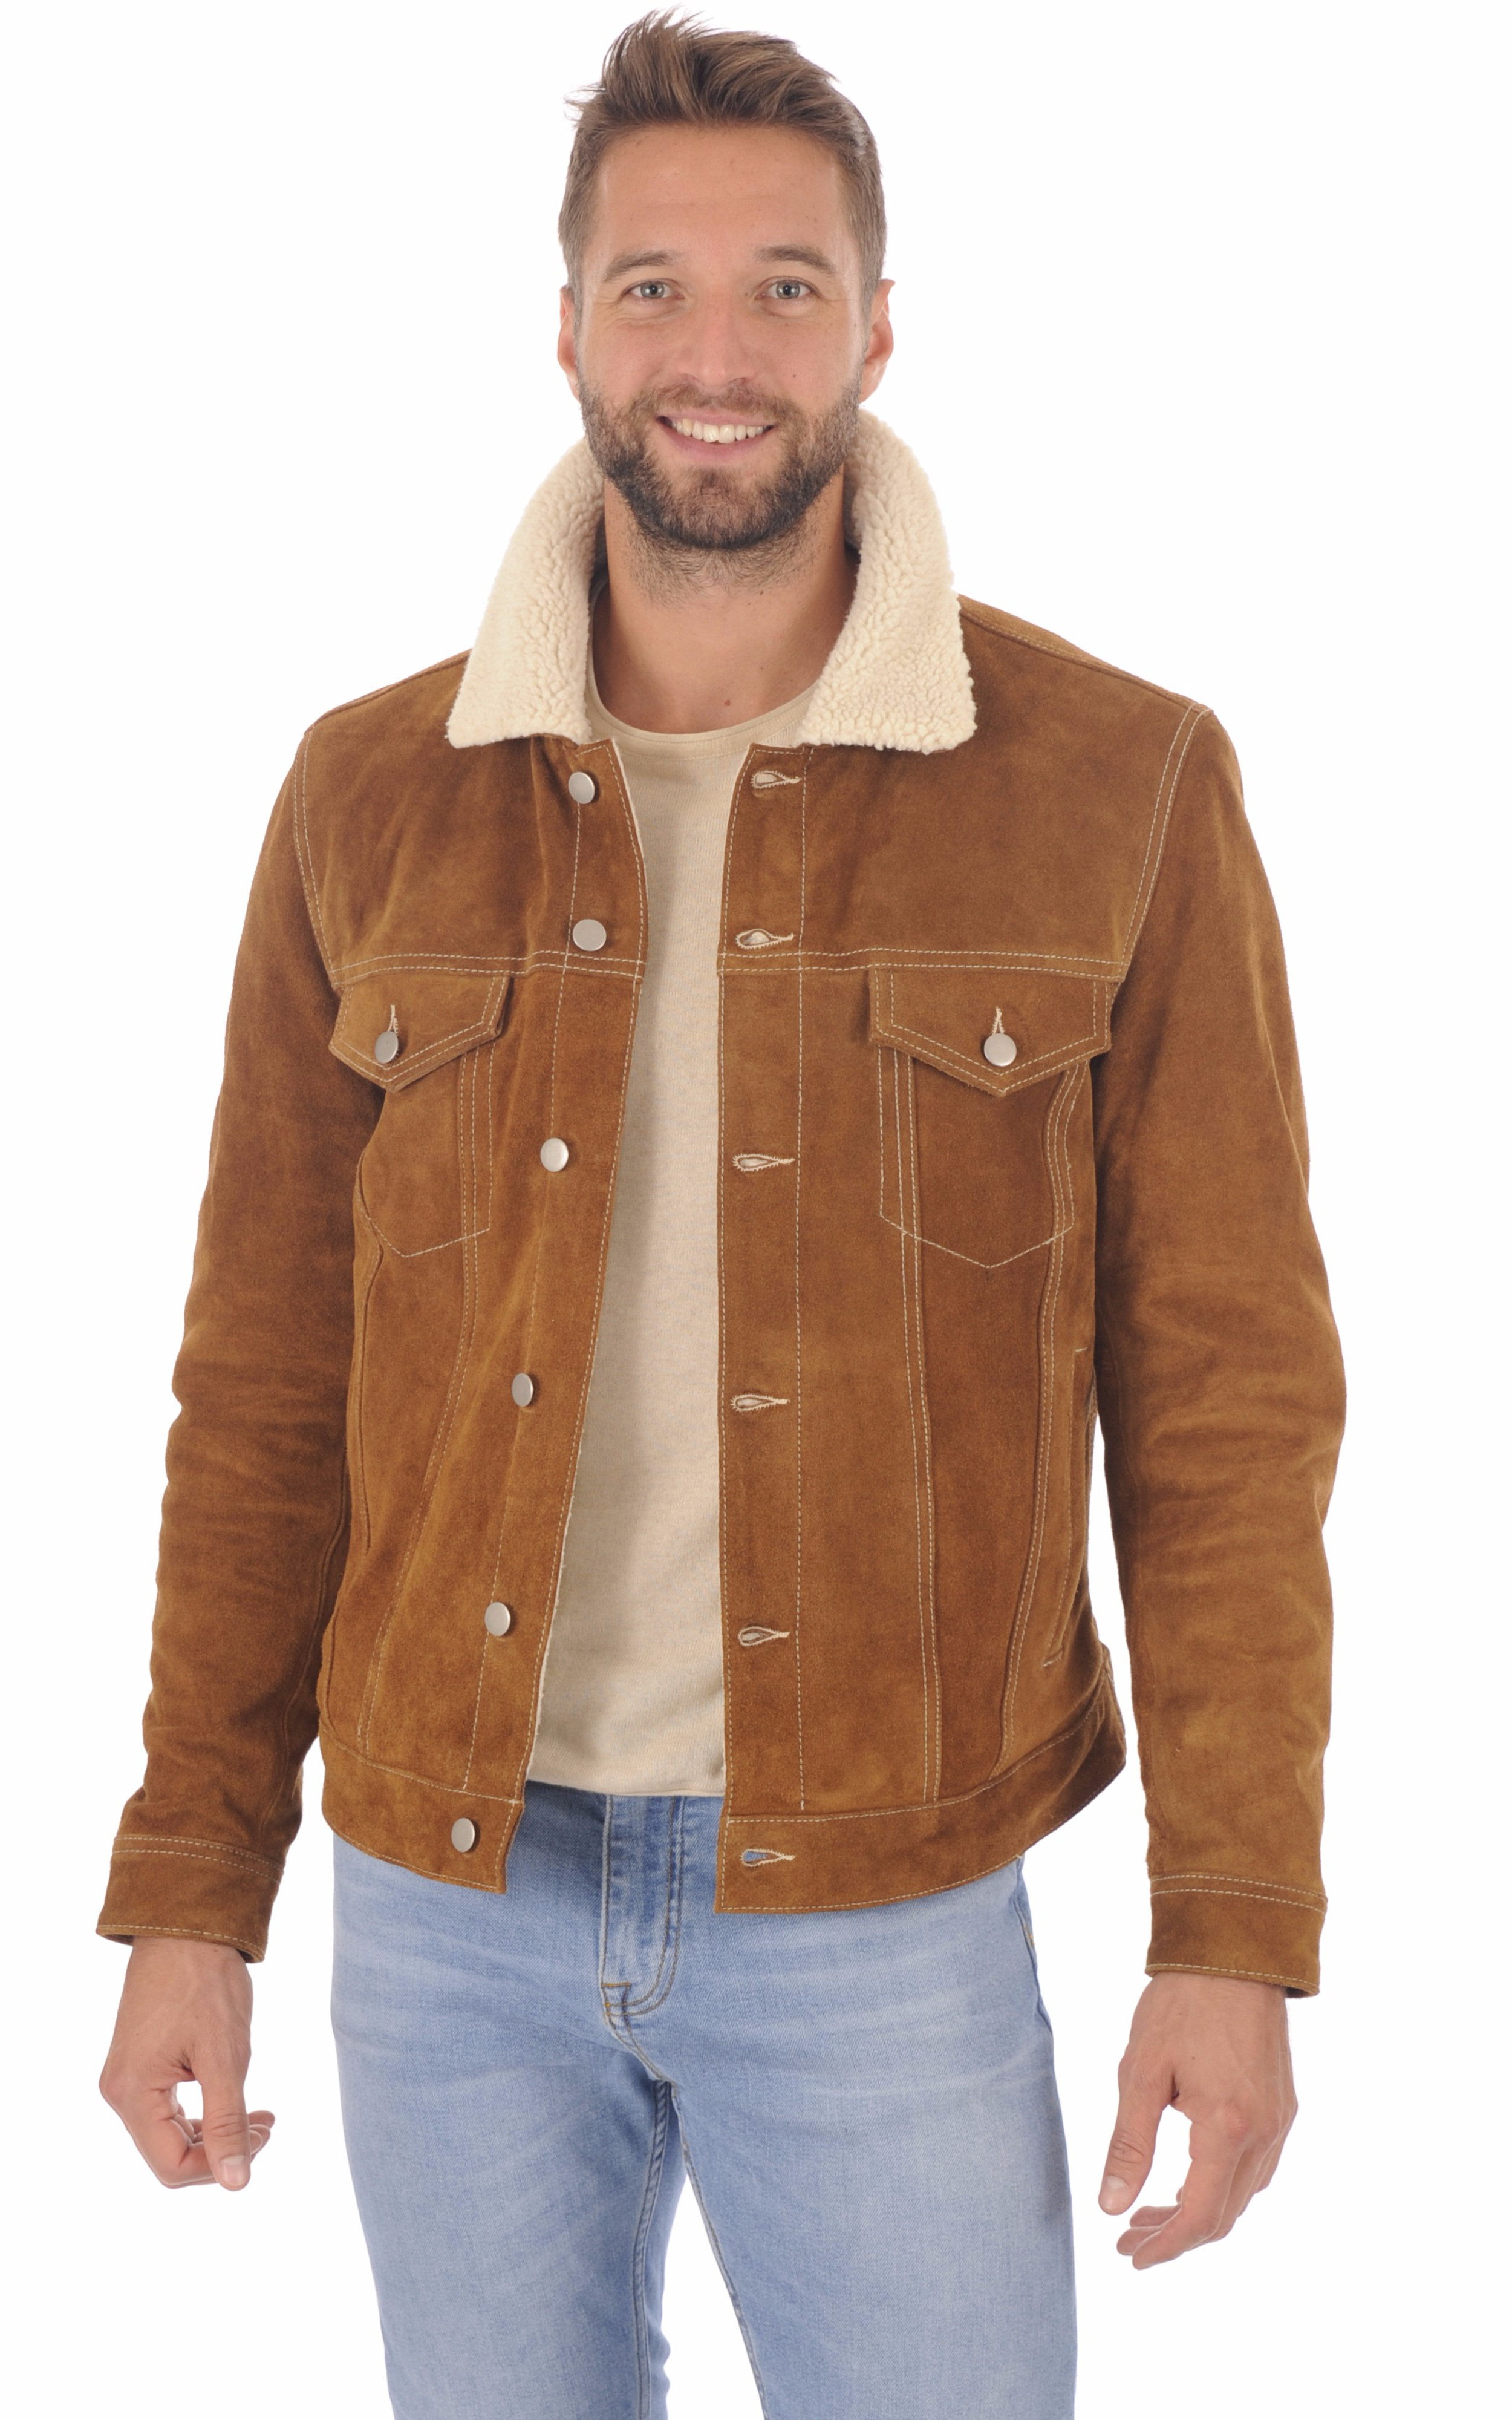 Veste Retro Homme Style Jean Daytona 73